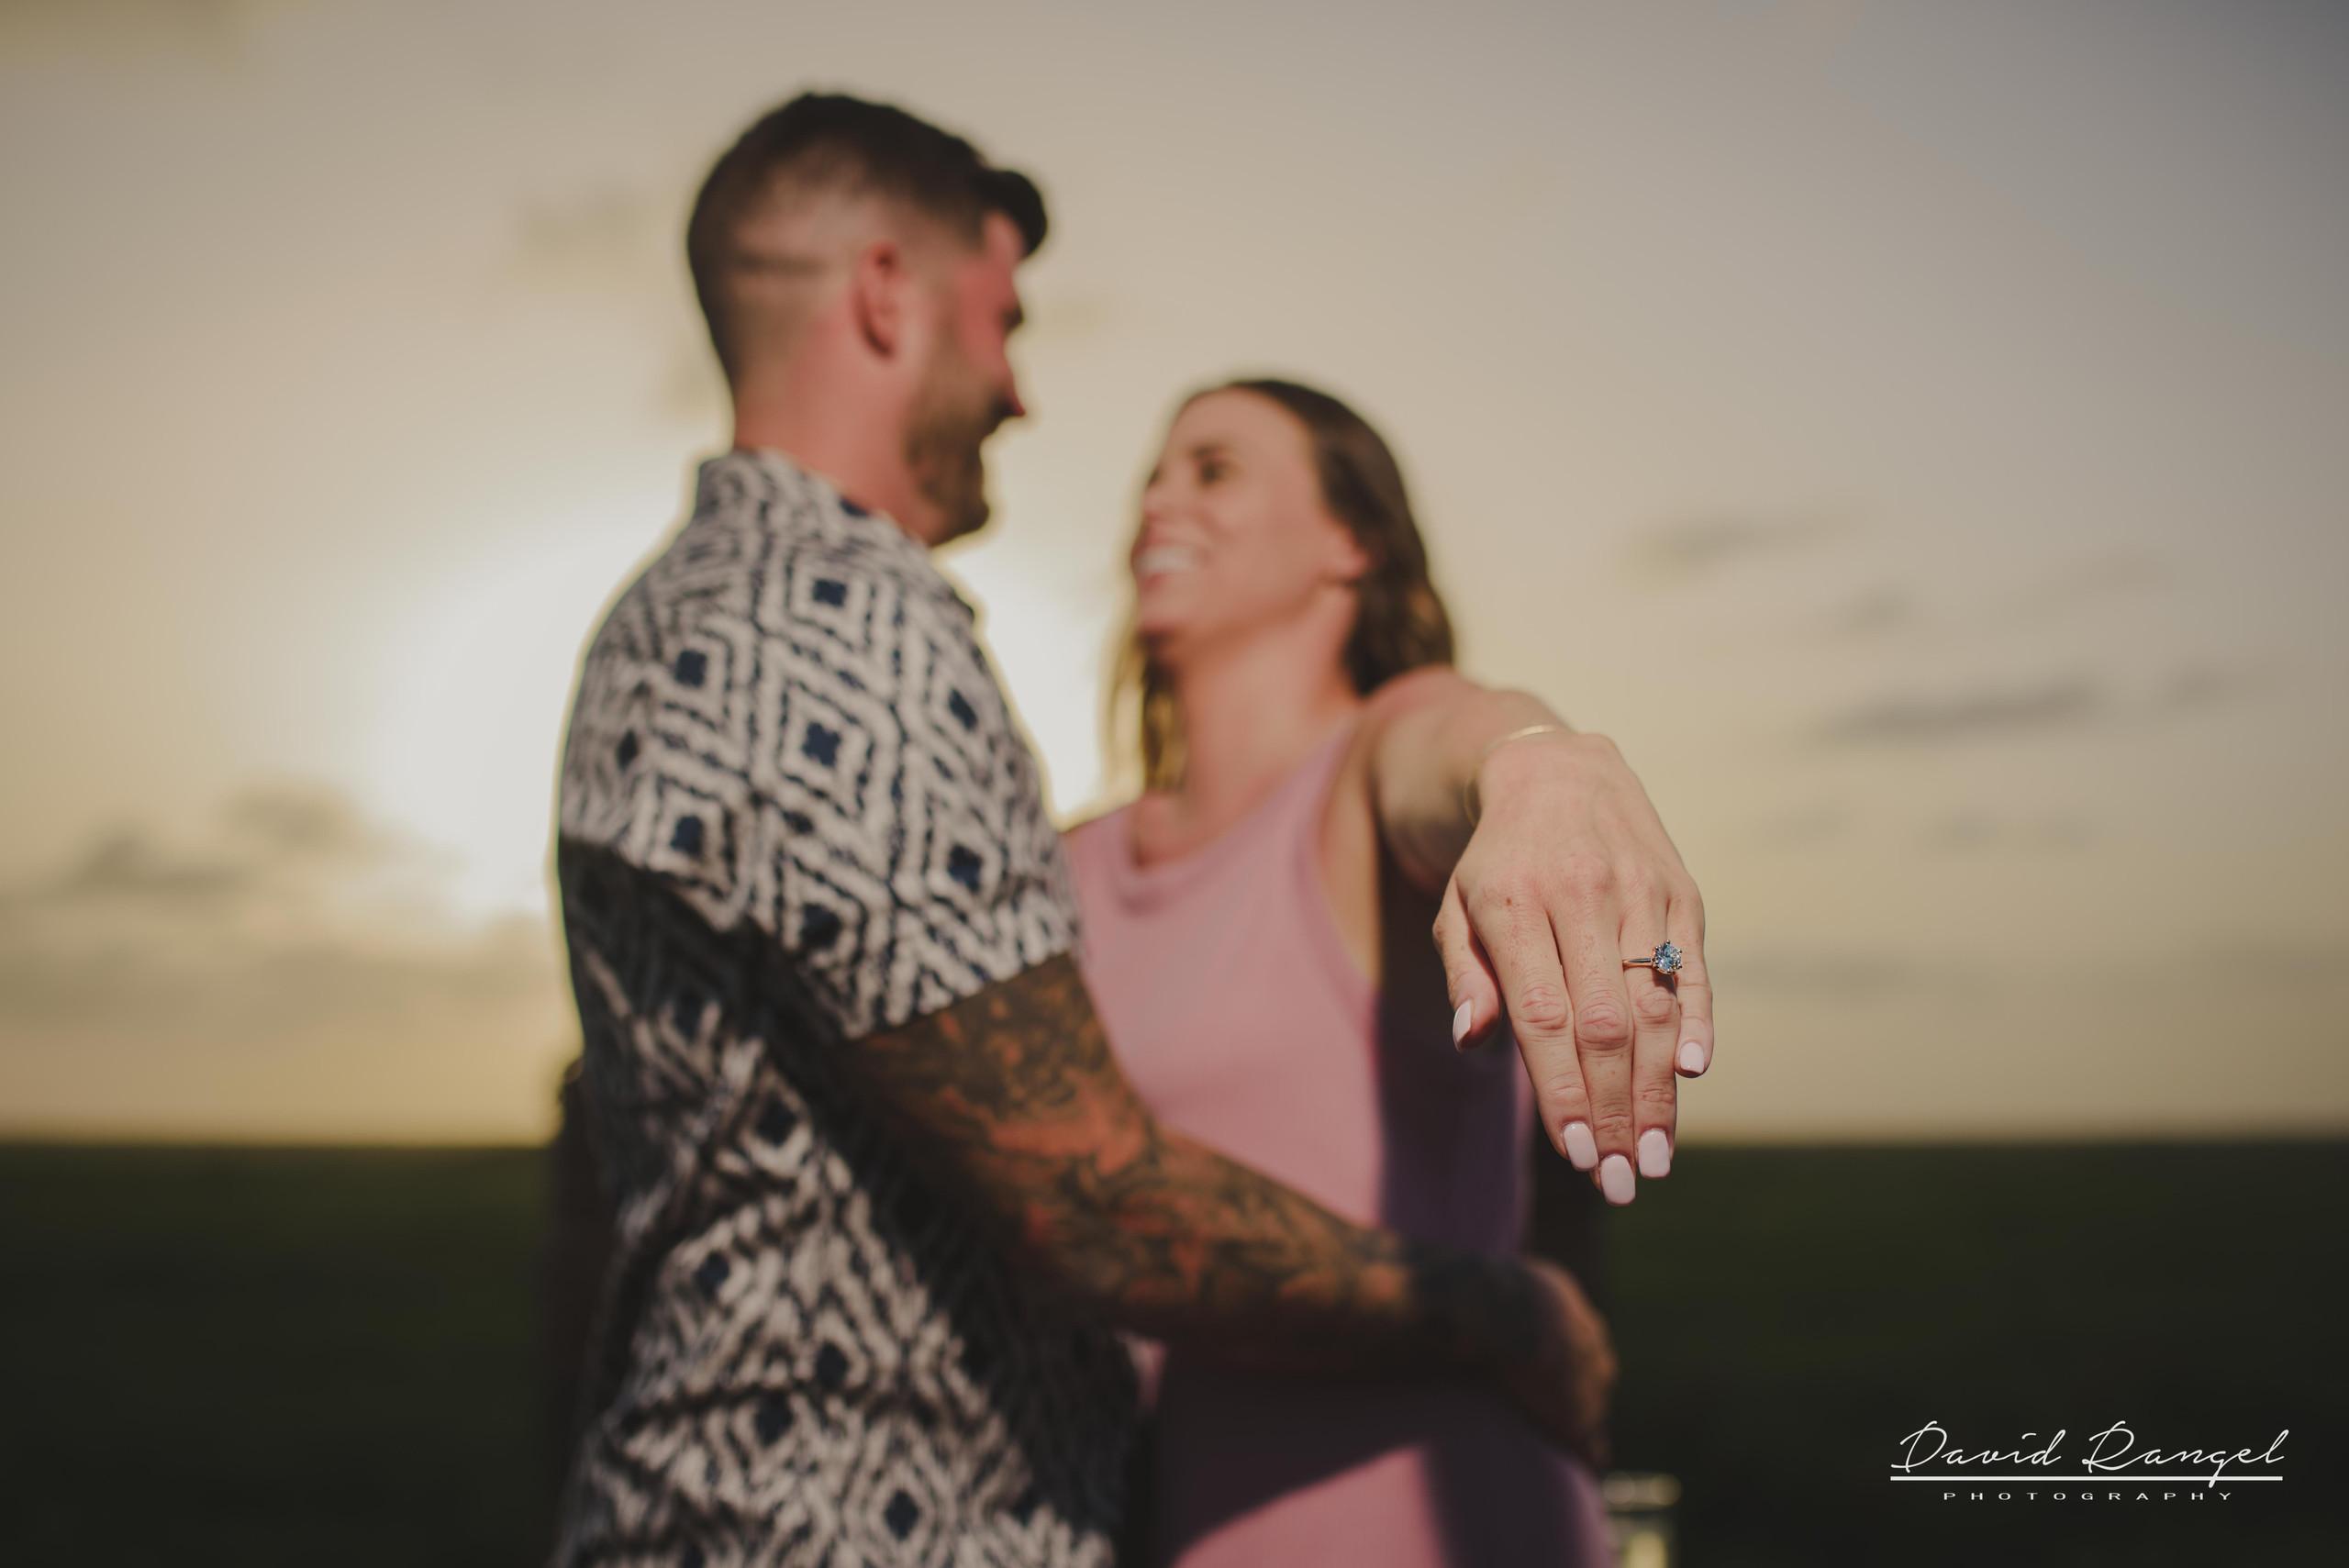 proposal+engagement+couple+dinner+hun+tulum+love+garden+nature+overthetrees+session+photoshot+destination+photographer+photo+ring+sunset